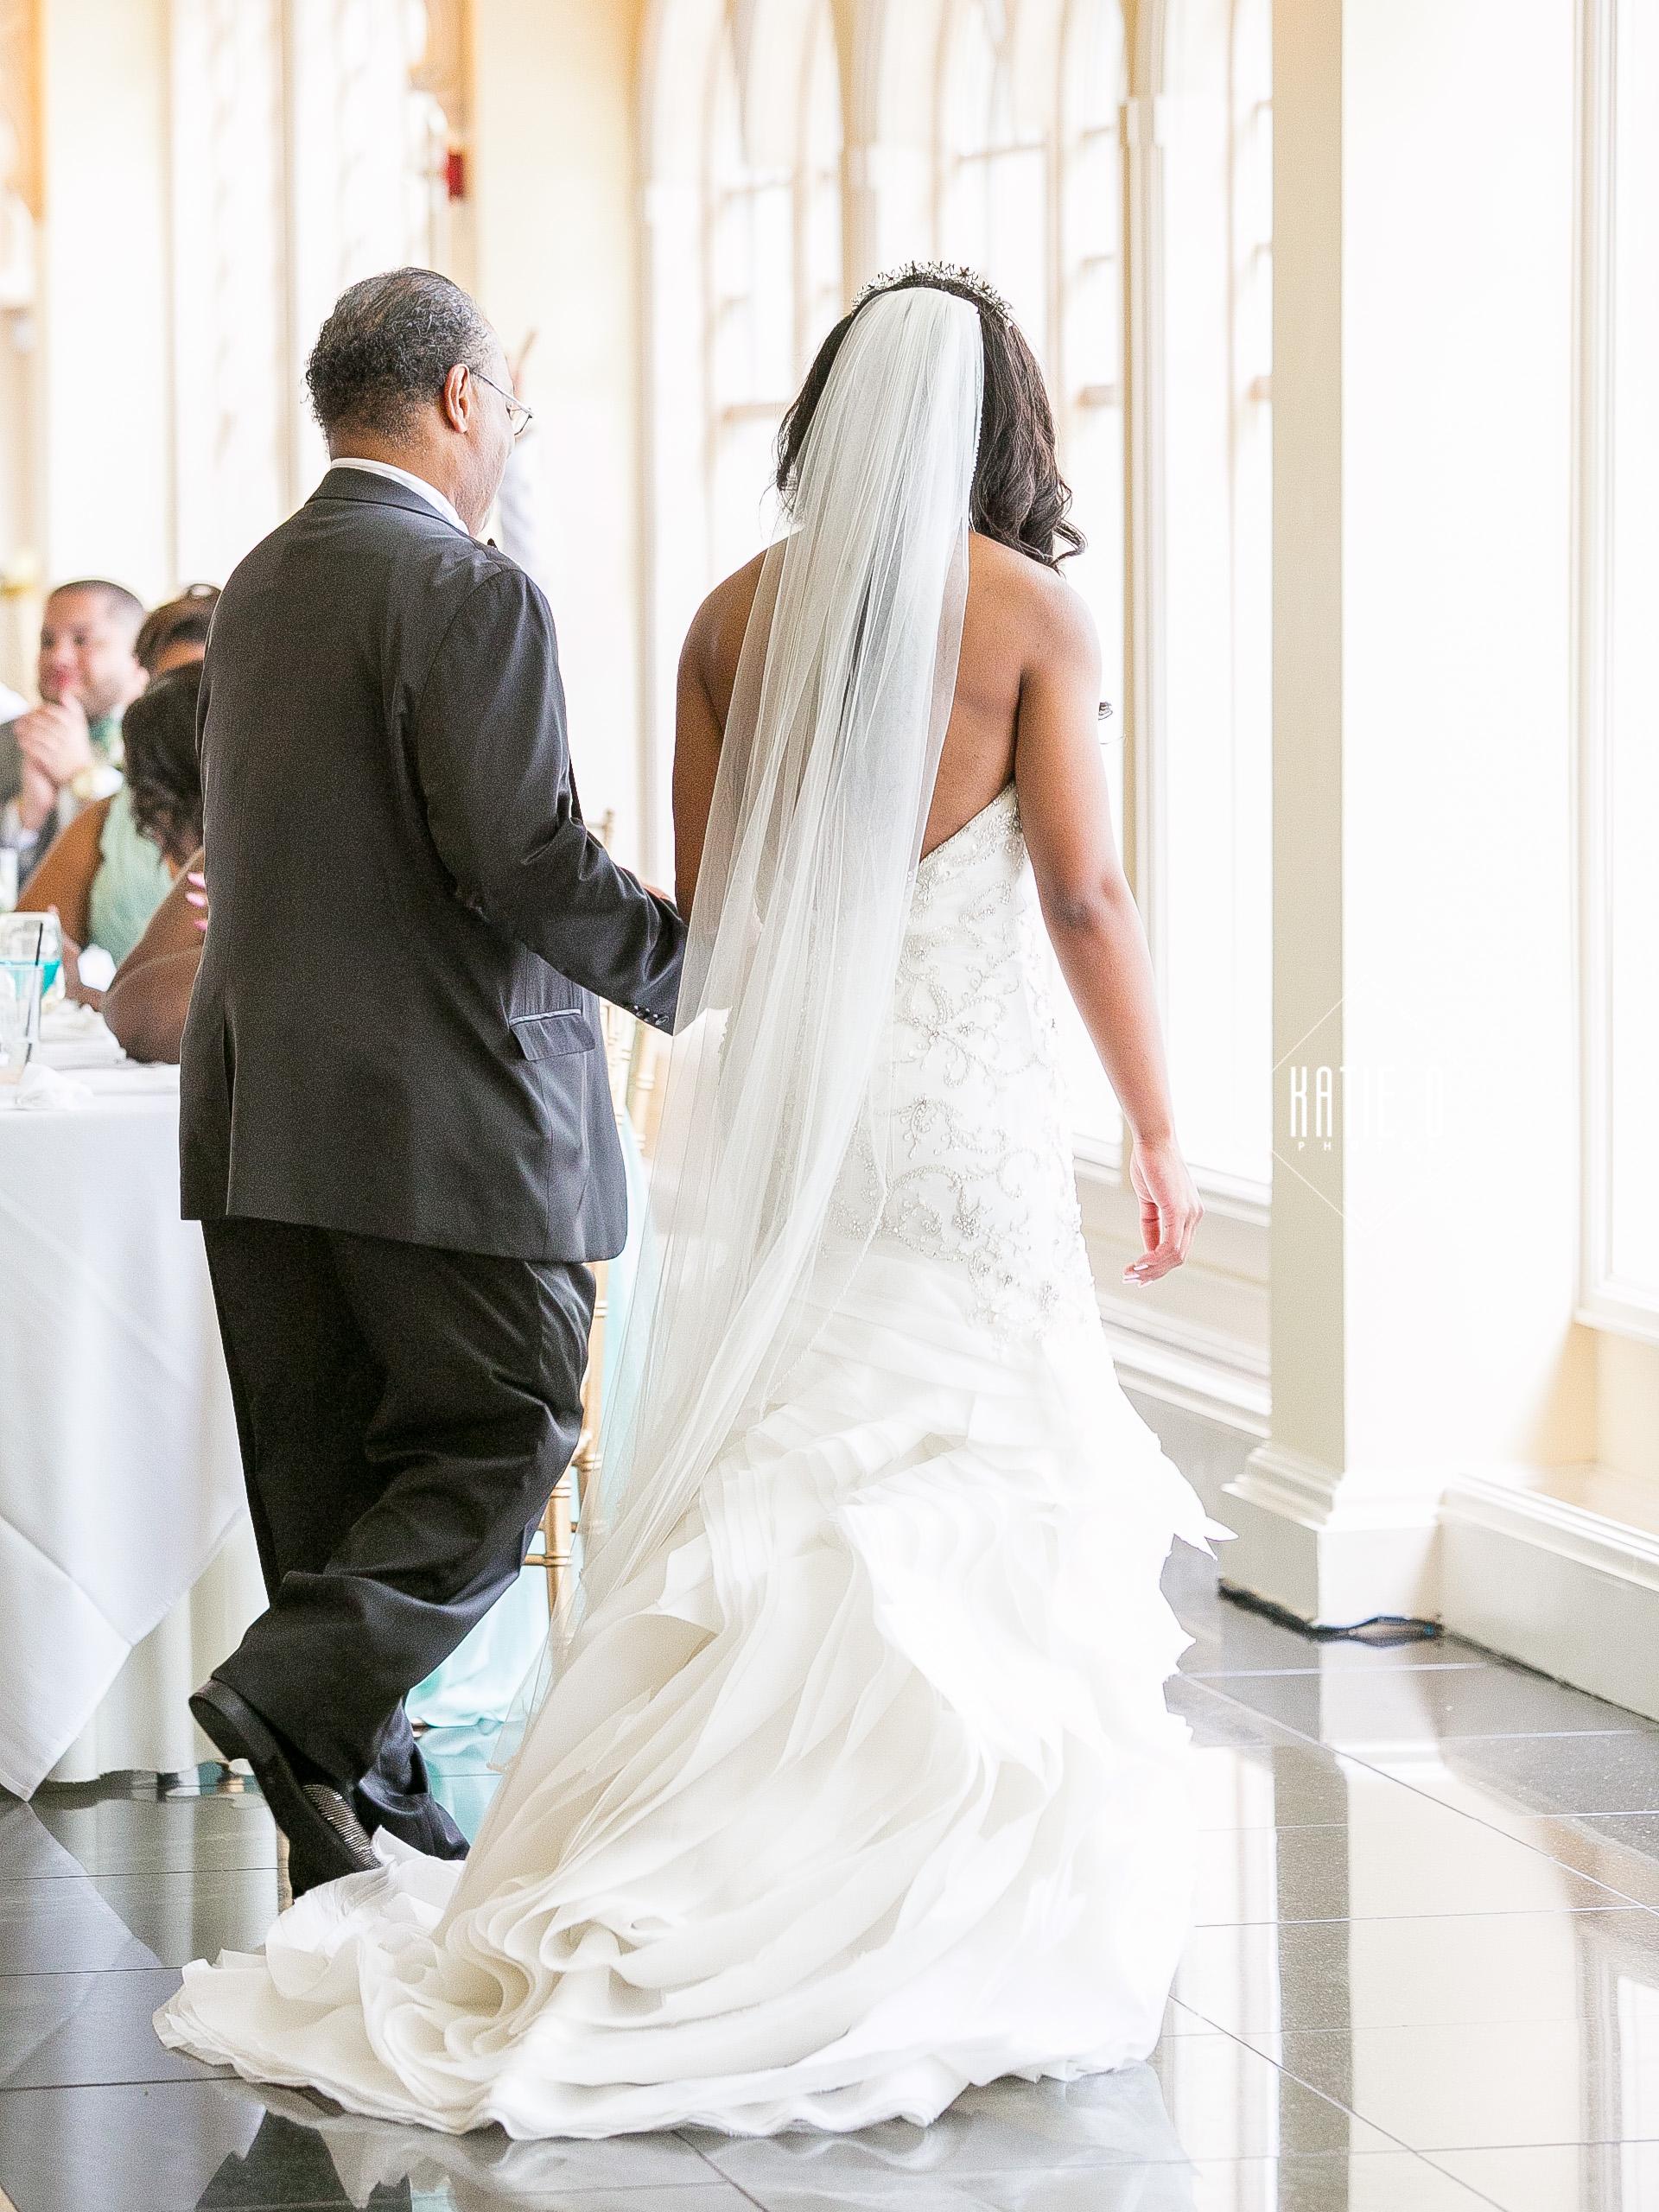 CT-WEDDING-PHOTOGRAPHER-BLOG-54.jpg